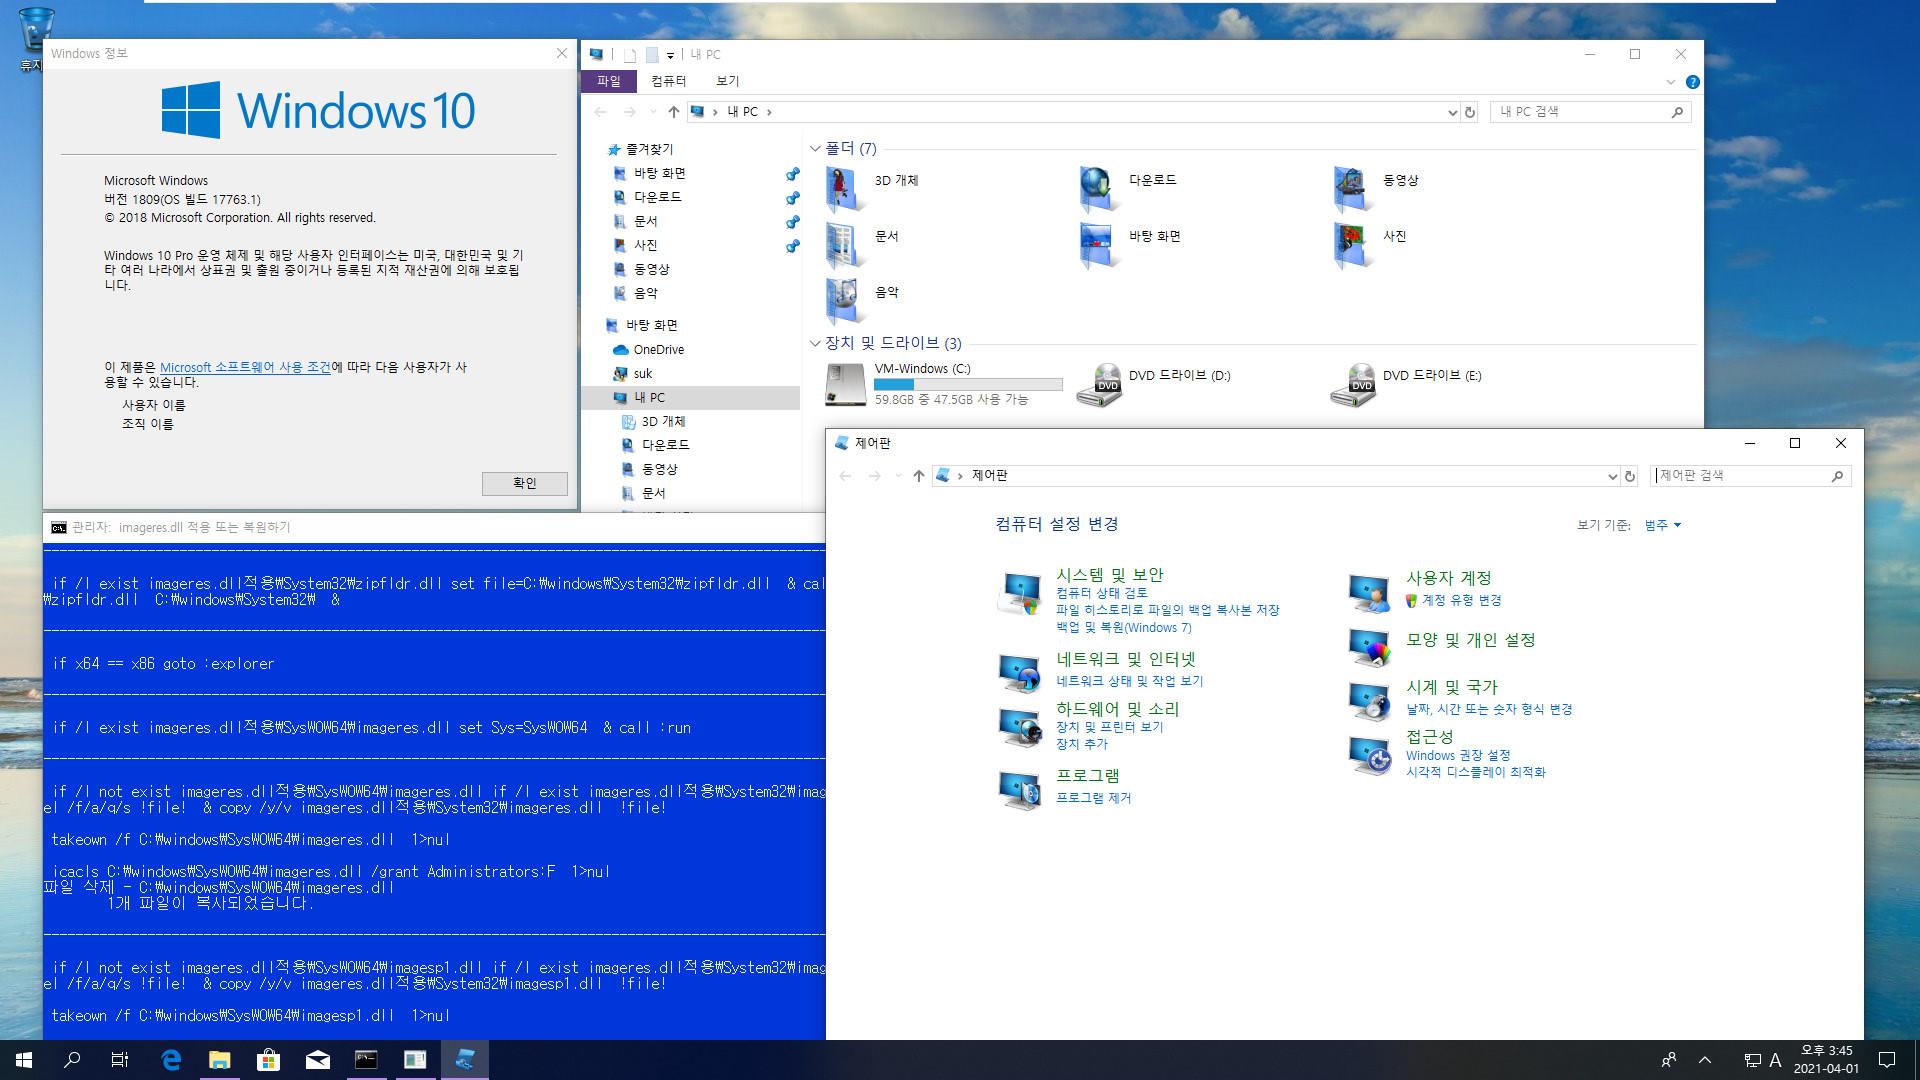 imageres.dll적용하기4.bat - 옛날 무등산님 아이콘 적용 - 윈도우 10 버전 1809 - 2021-04-01_154535.jpg